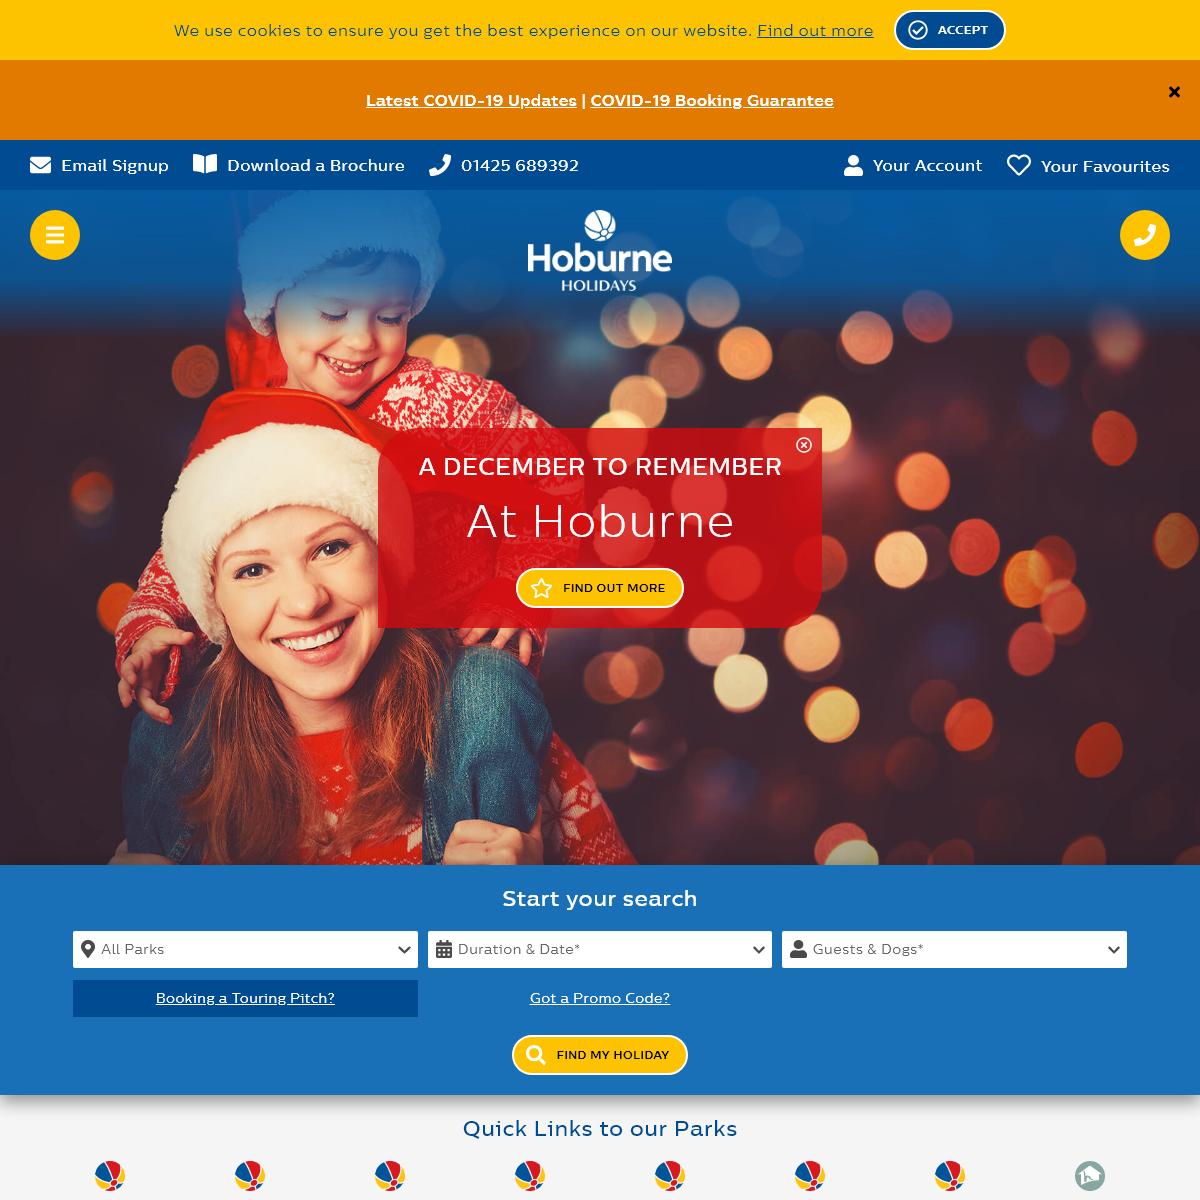 UK Holiday Parks - Self-Catering Holidays - Hoburne Holidays